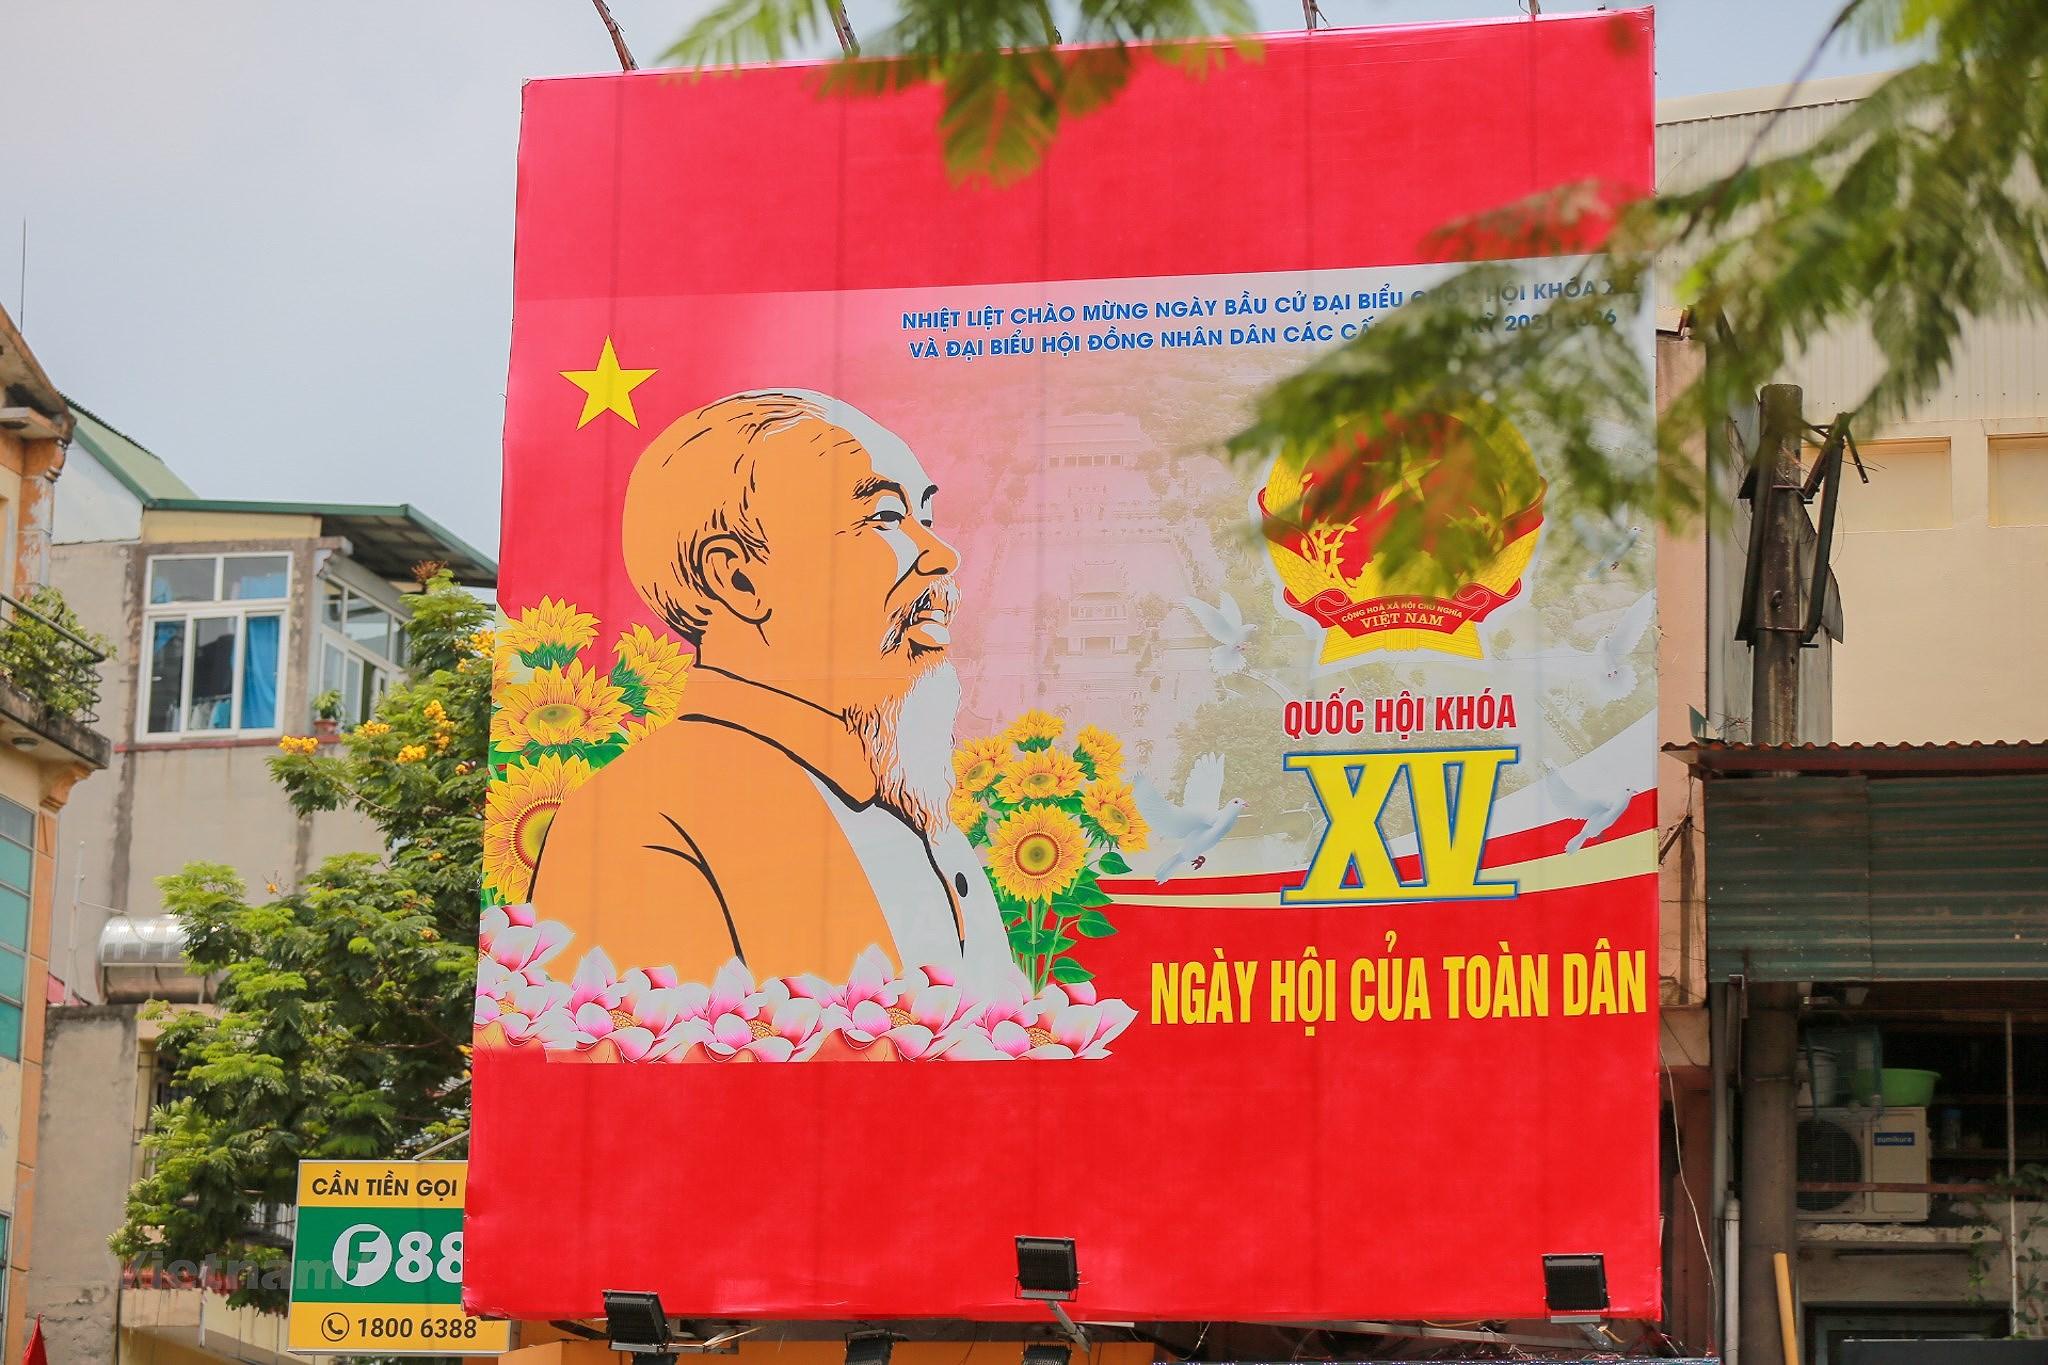 Pho phuong Ha Noi ruc ro co hoa chao don ngay hoi trong dai toan quoc hinh anh 18